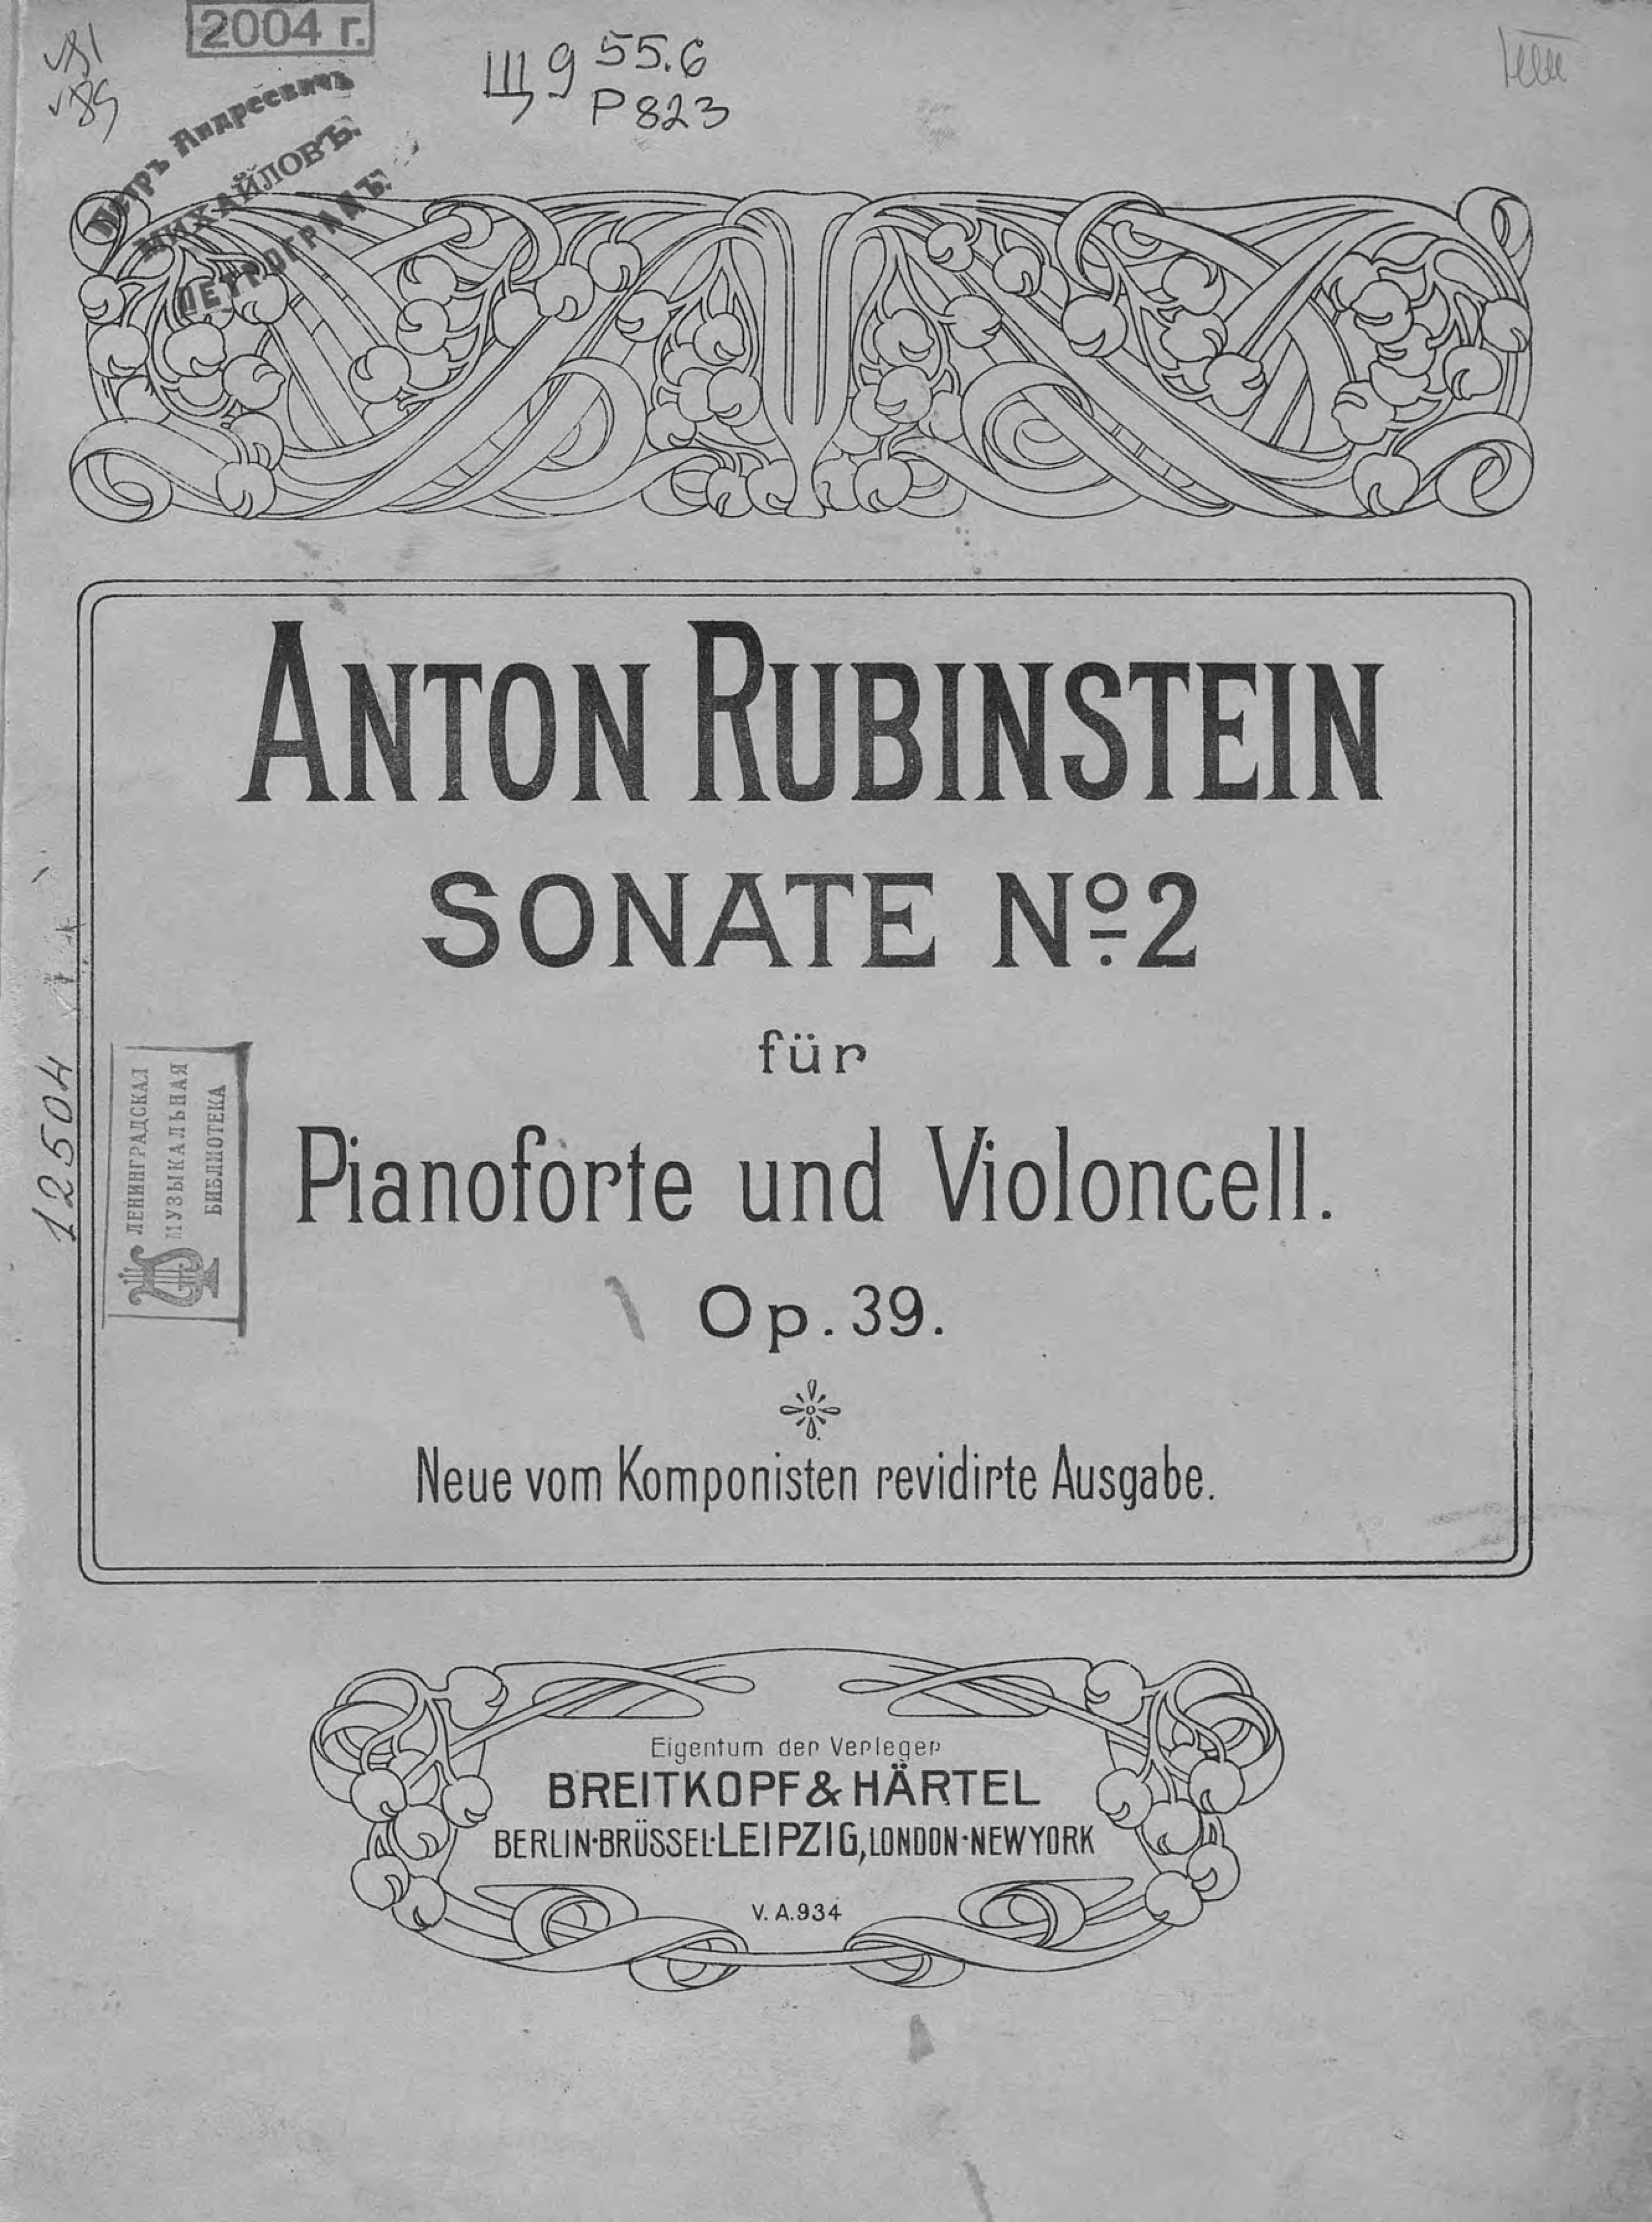 Антон Григорьевич Рубинштейн Sonate № 2 fur Pianoforte und Violoncell lexikon fur photographie und reproduktionstechnik